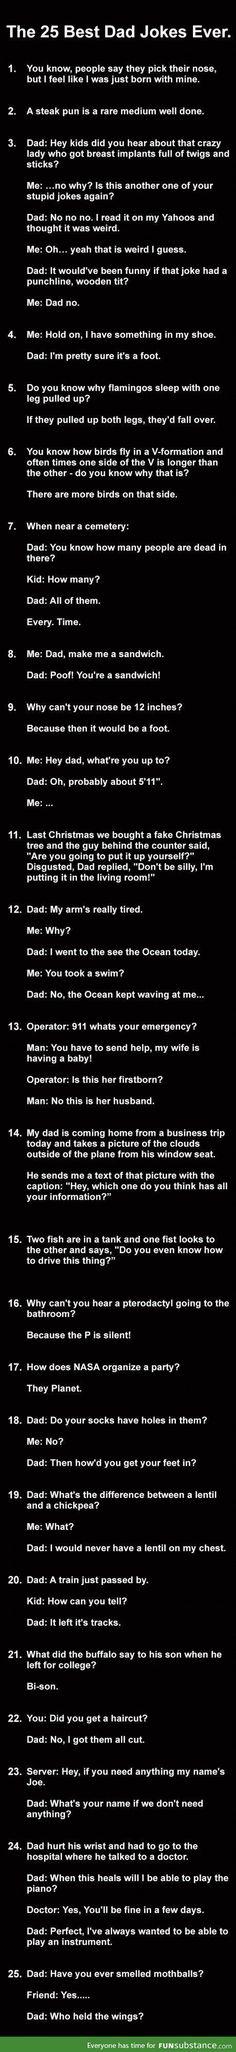 Funny clean jokes hilarious so true Trendy Ideas Jin Dad Jokes, Stupid Jokes, Funny Jokes For Kids, Corny Jokes, Funny Jokes To Tell, Good Jokes, Hilarious, Dad Puns, Cheesy Jokes